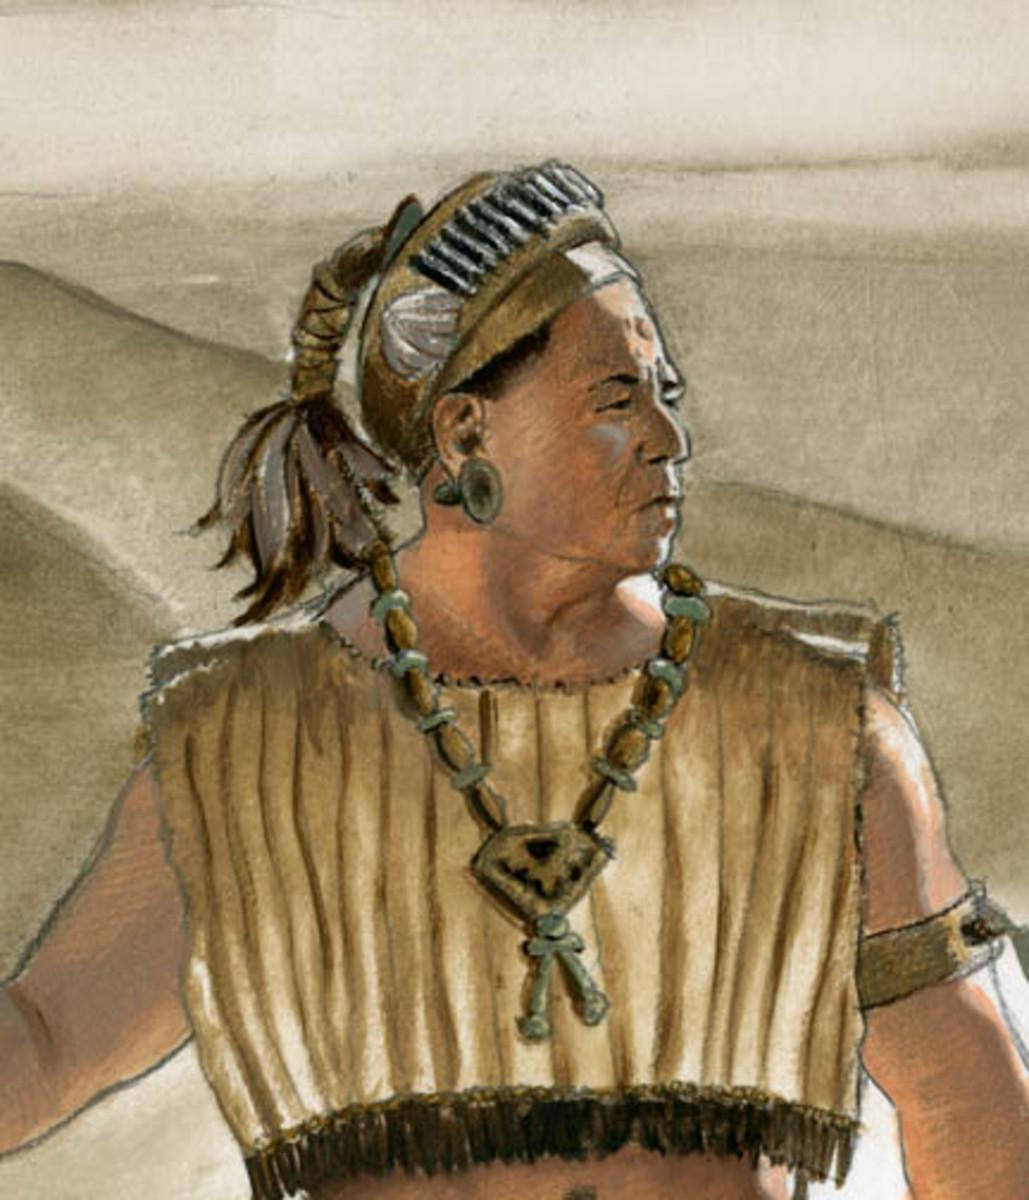 amalickiah-the-ruthless-hegemony-of-a-self-made-king